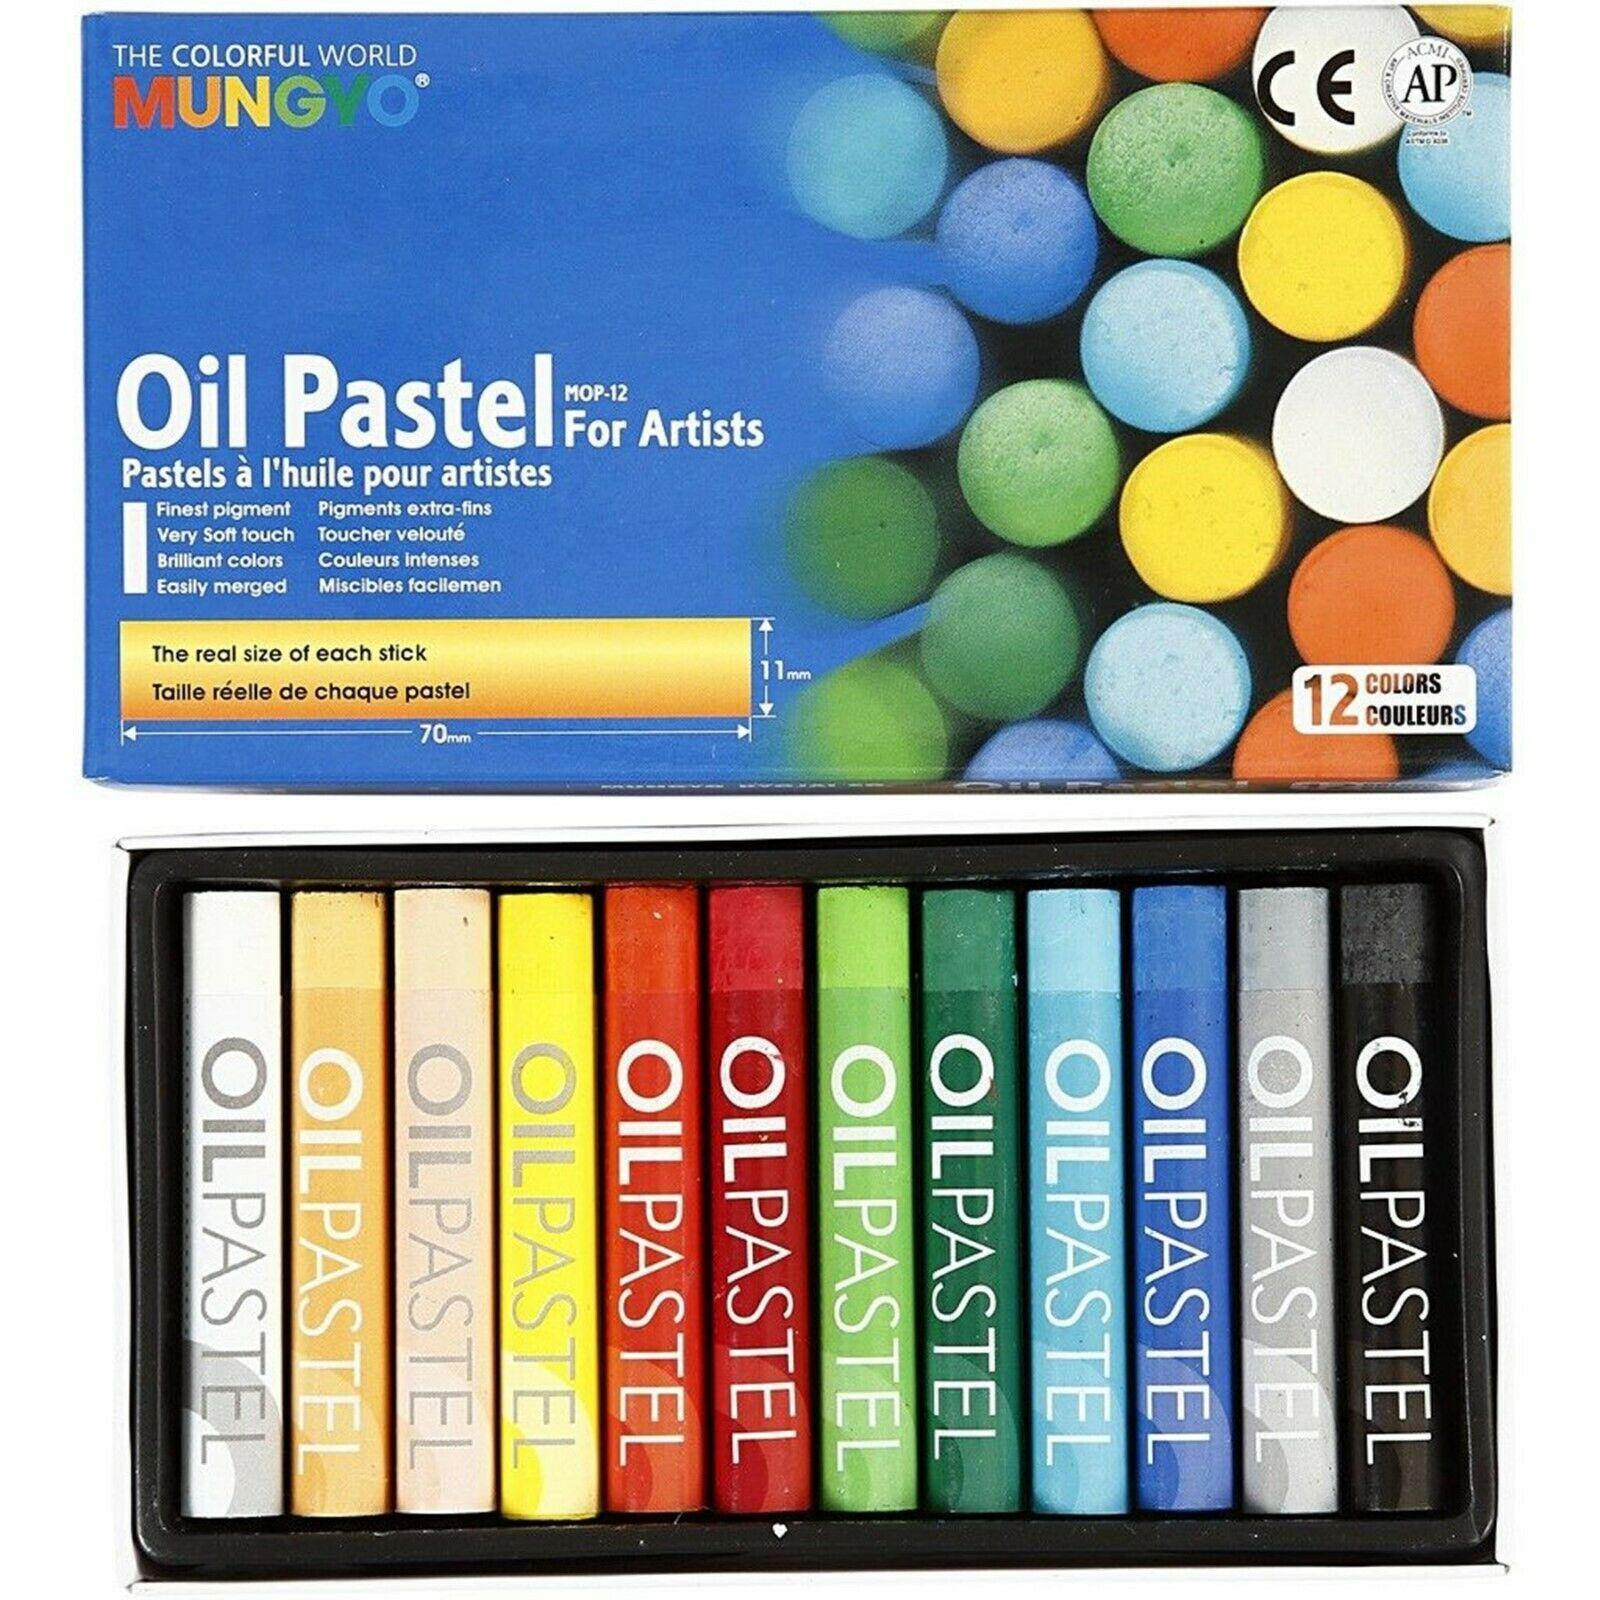 Oil Pastels Mungyo Brand 12 Pastels Quality Colours Art Supplies 70 x 11 mm CR72